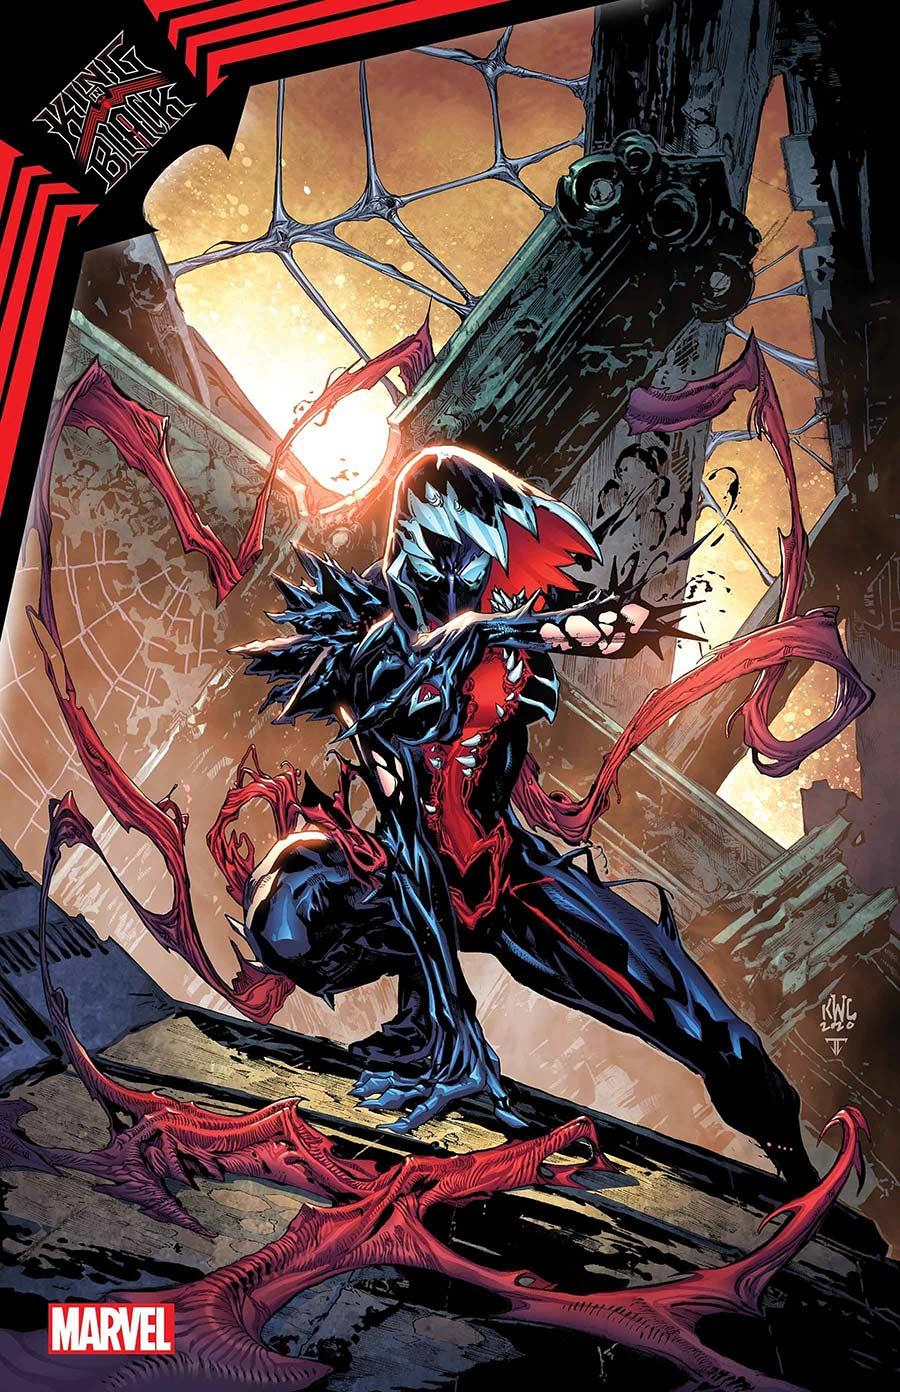 King In Black: Gwenom Vs Carnage